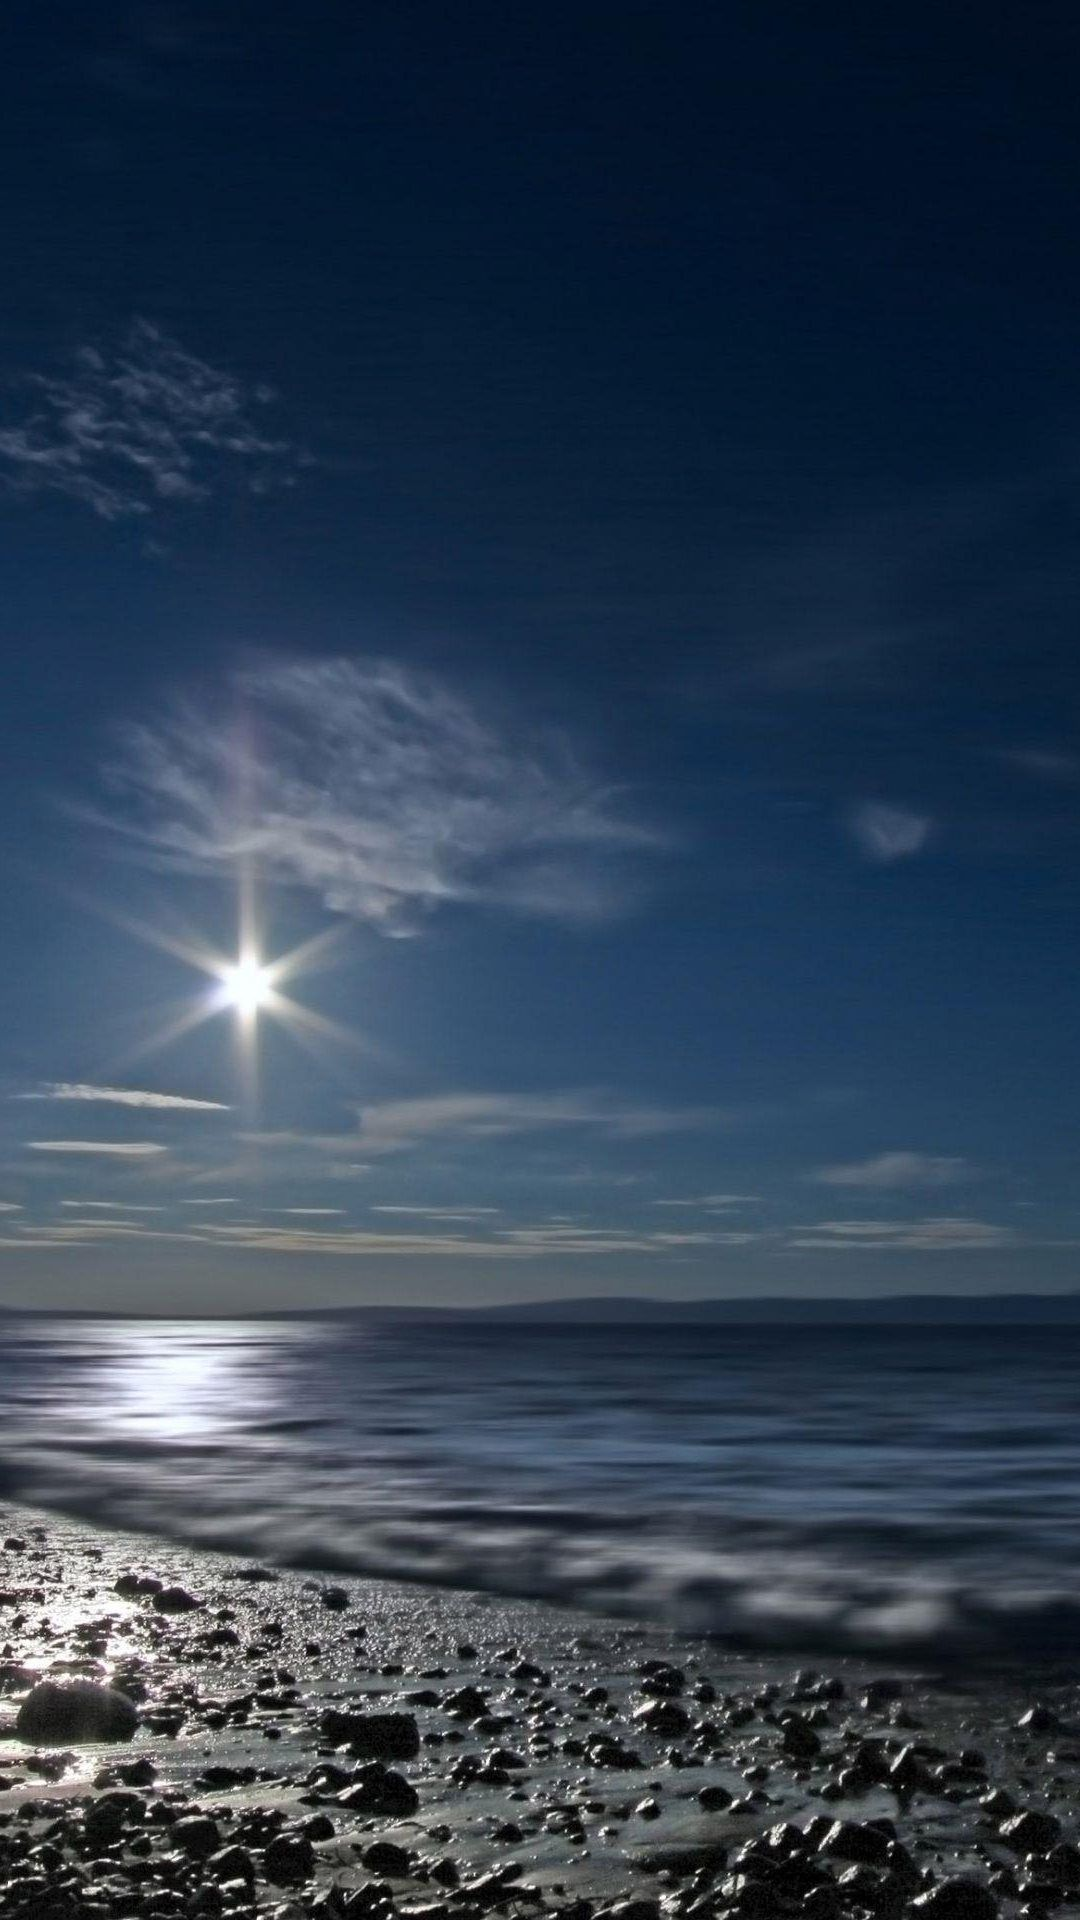 Wallpaper iphone sea - Shining Moon Over Sea Iphone 6 Wallpaper